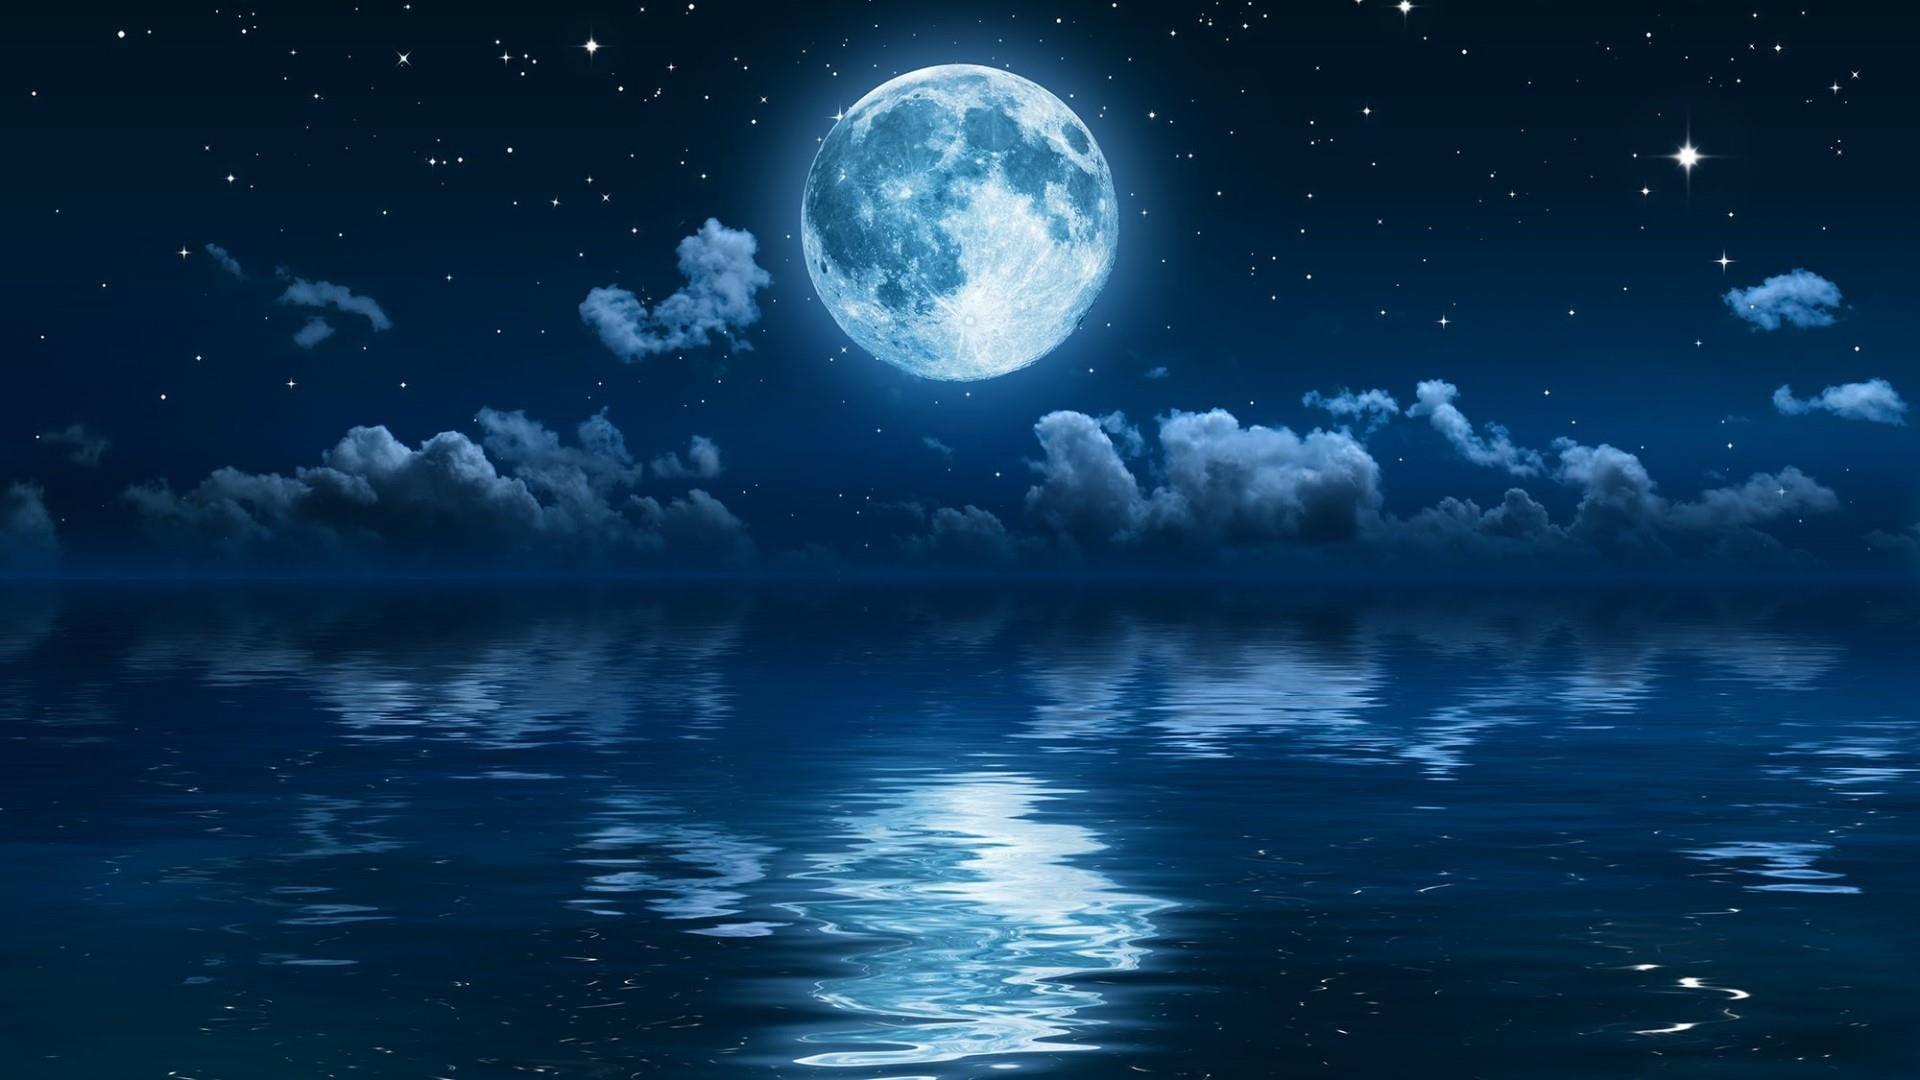 Full Moon Stars Sea Sky Night Night Sky Moon 1080p Wallpaper Hdwallpaper Desktop Night Sky Wallpaper Night Sky Moon Moon And Stars Wallpaper